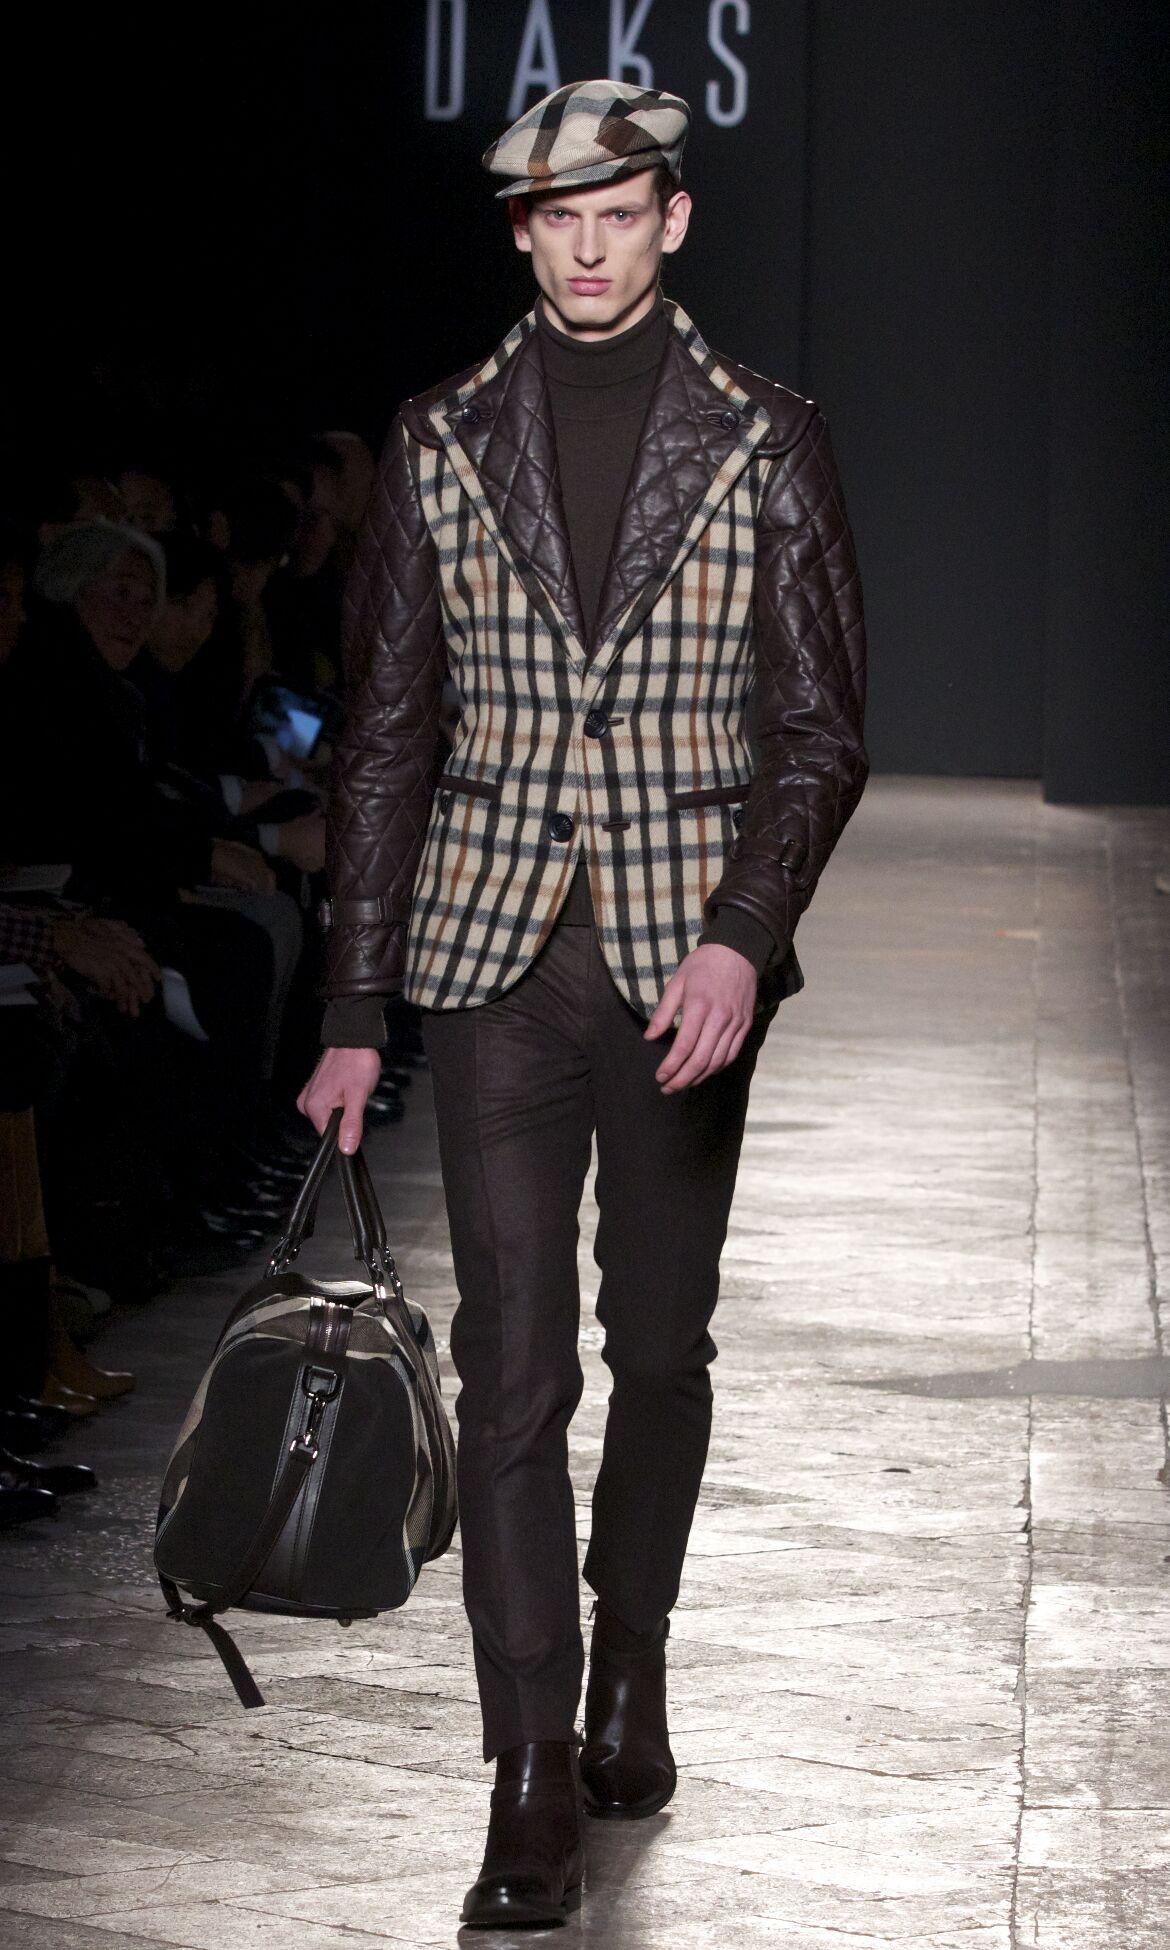 Daks Fashion Model